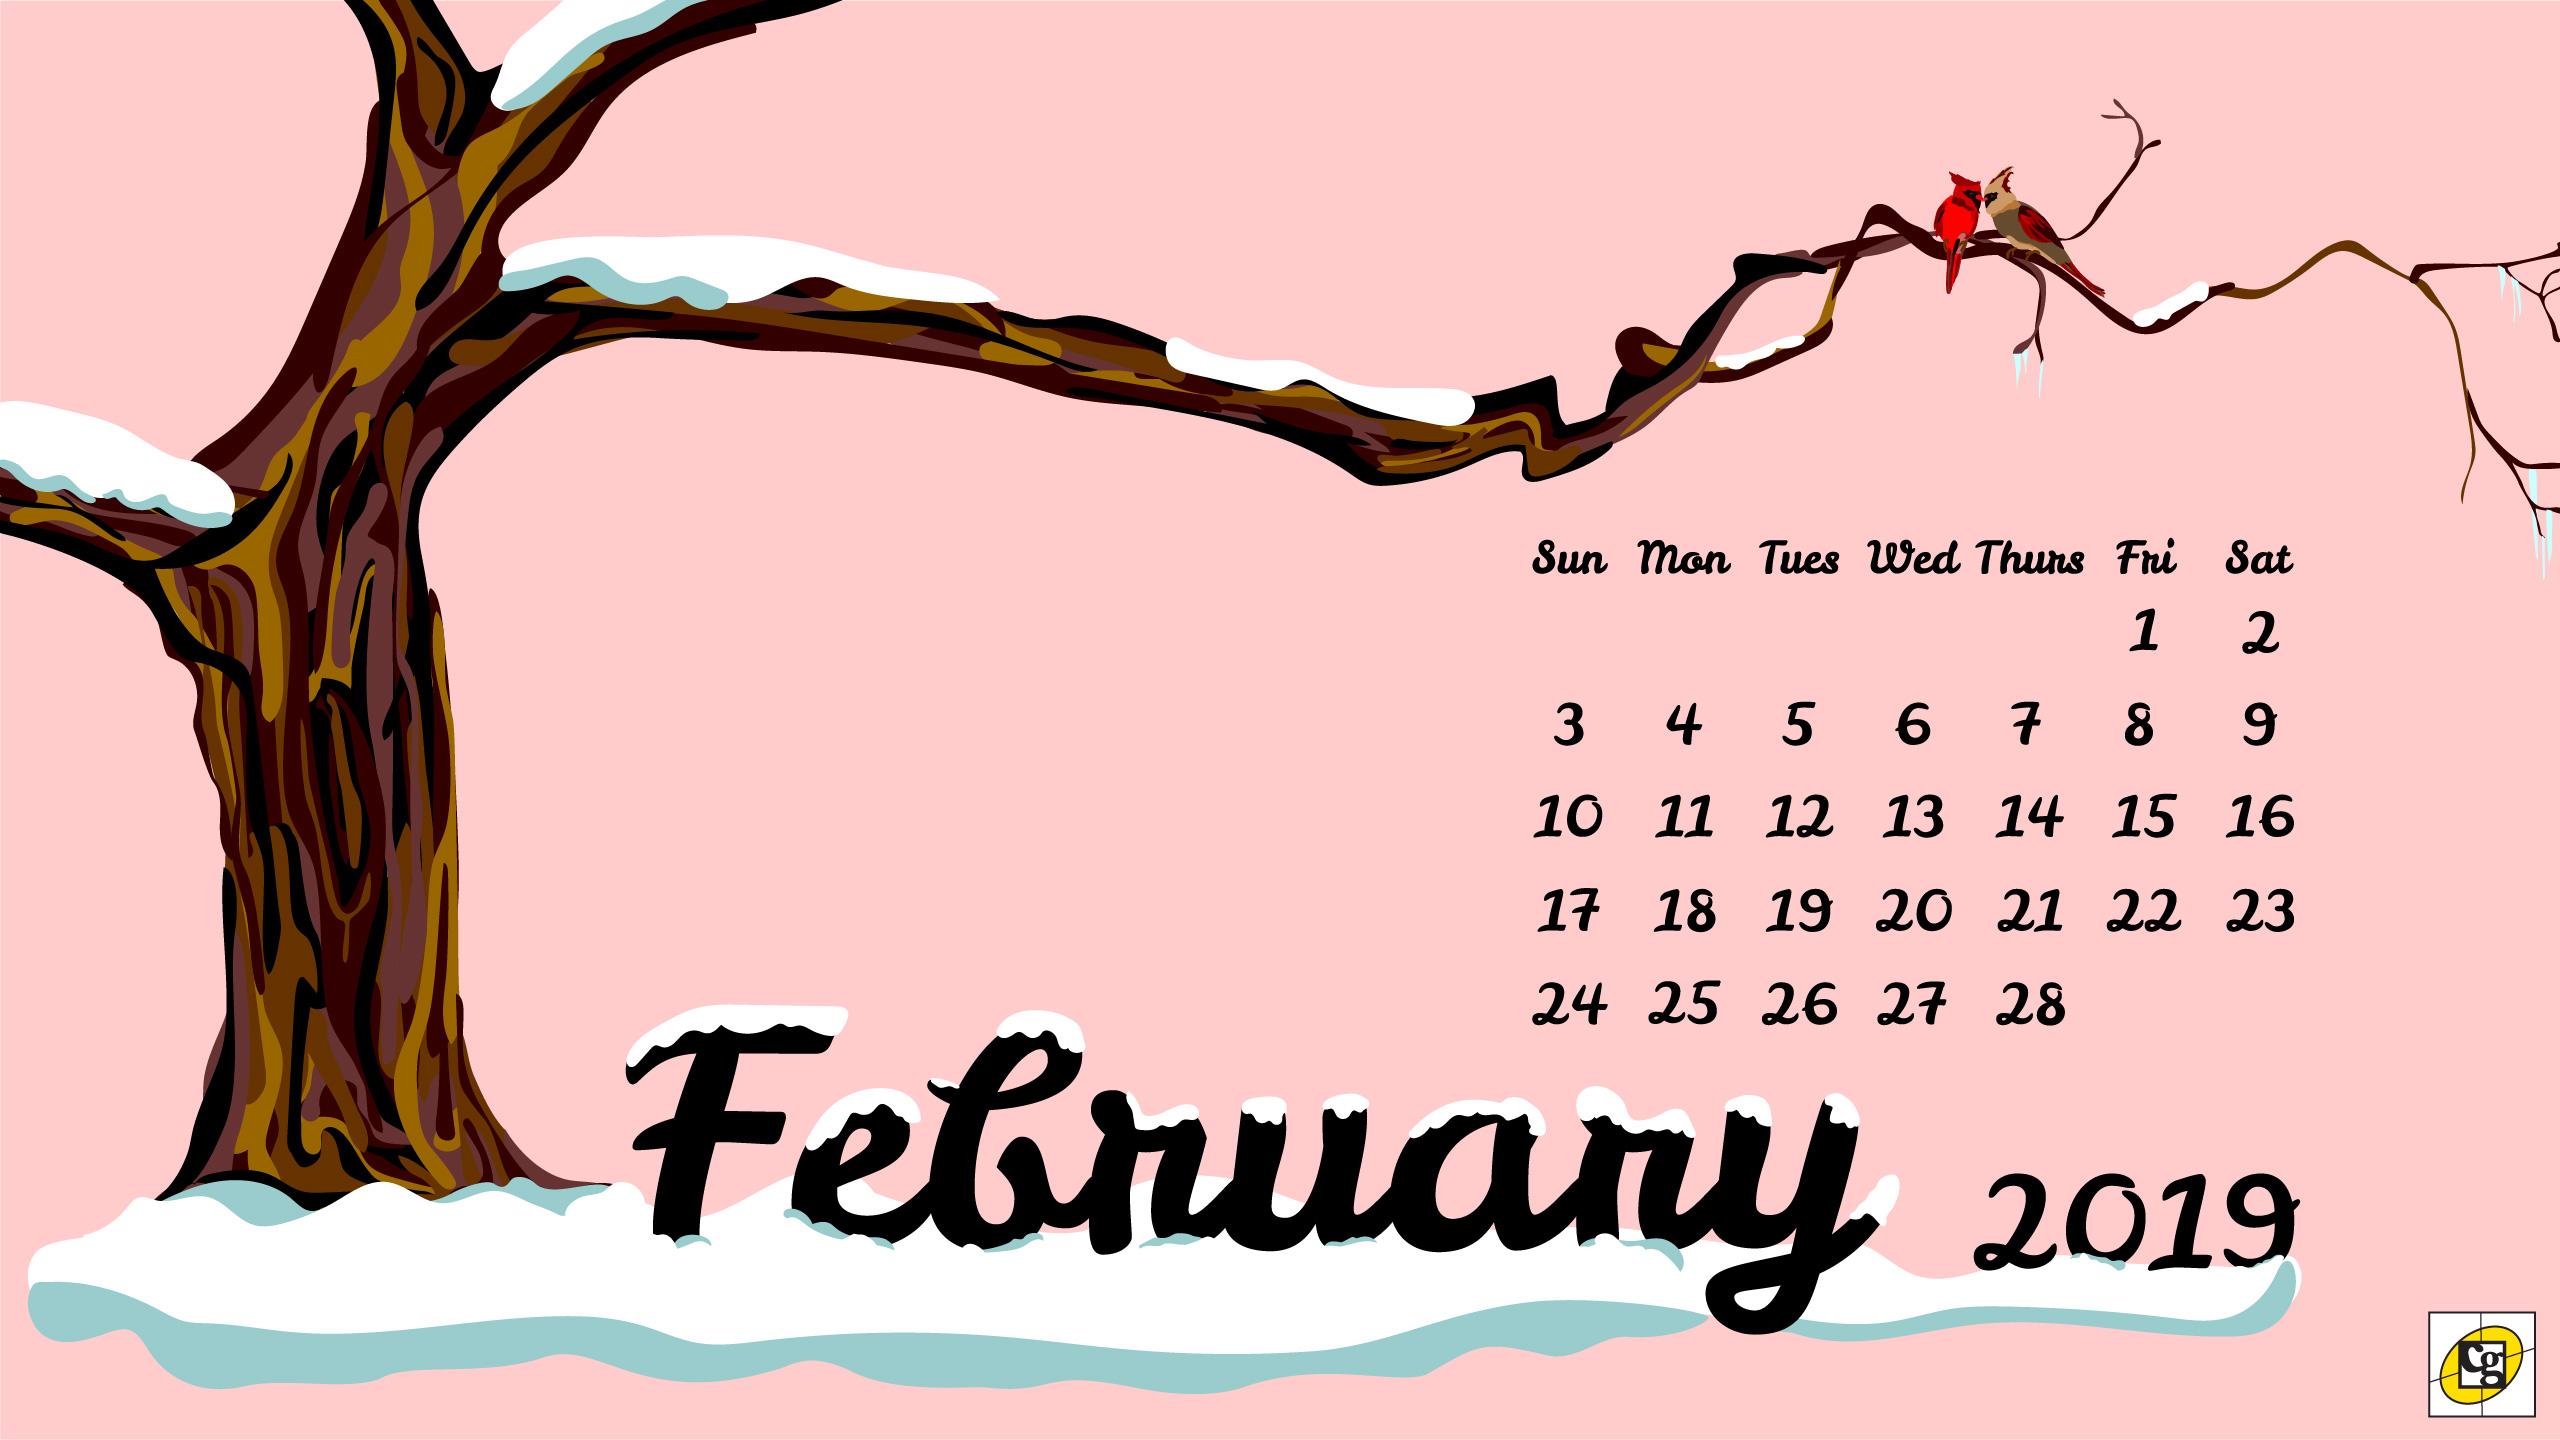 Desktop Calendar February 2019 Free Download: February 2019 Desktop Calendar   Composure Graphics